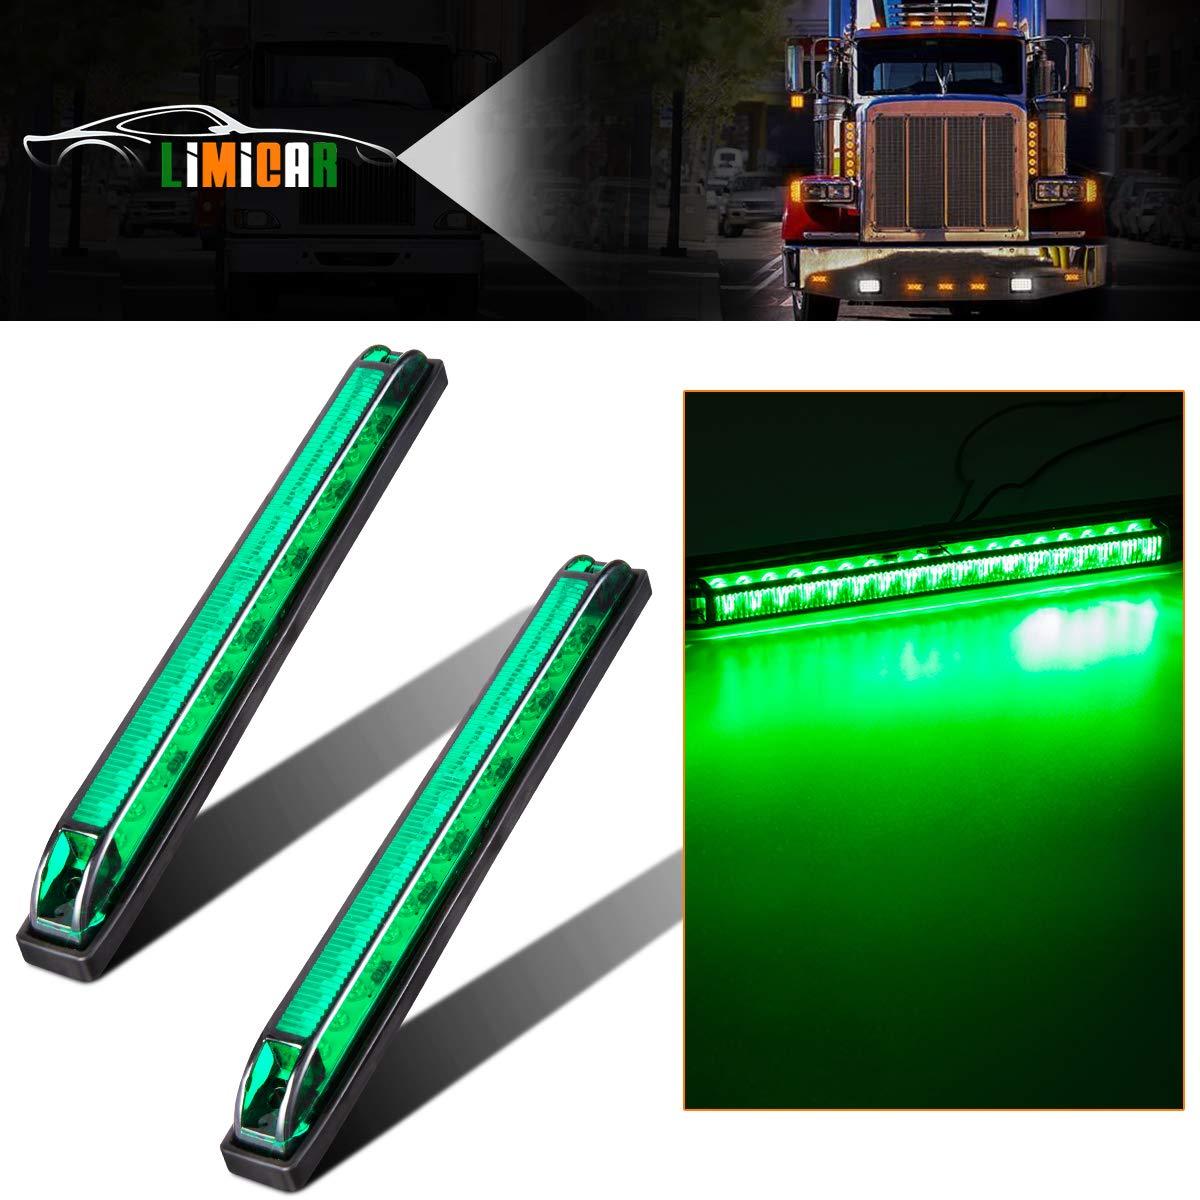 LIMICAR 2PCS Led Marker Light Utility Strip Bar Led Marker Clearance Light 12V 8'' Truck Trailer Boat 18 LED Green